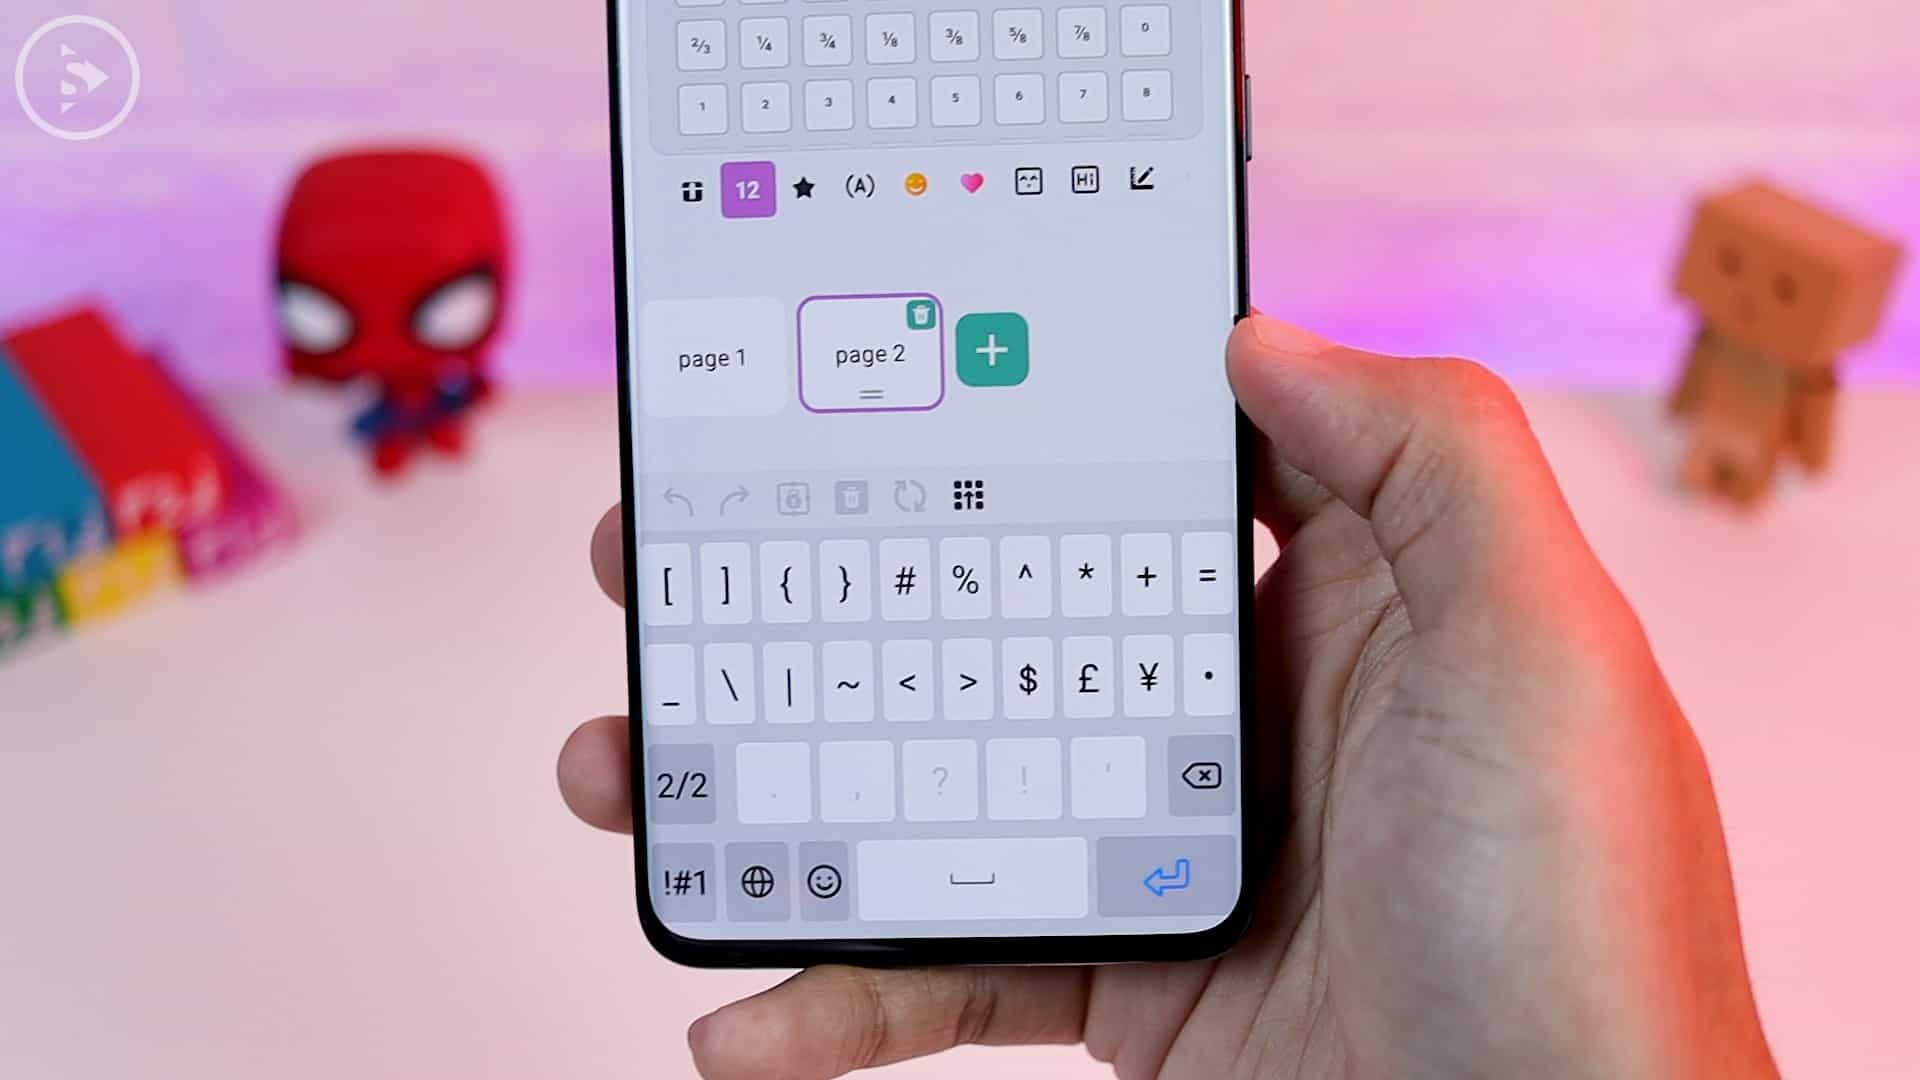 Tips Aplikasi Keys Cafe Terbaru Good Lock - ganti huruf dan simbol ada 2 page